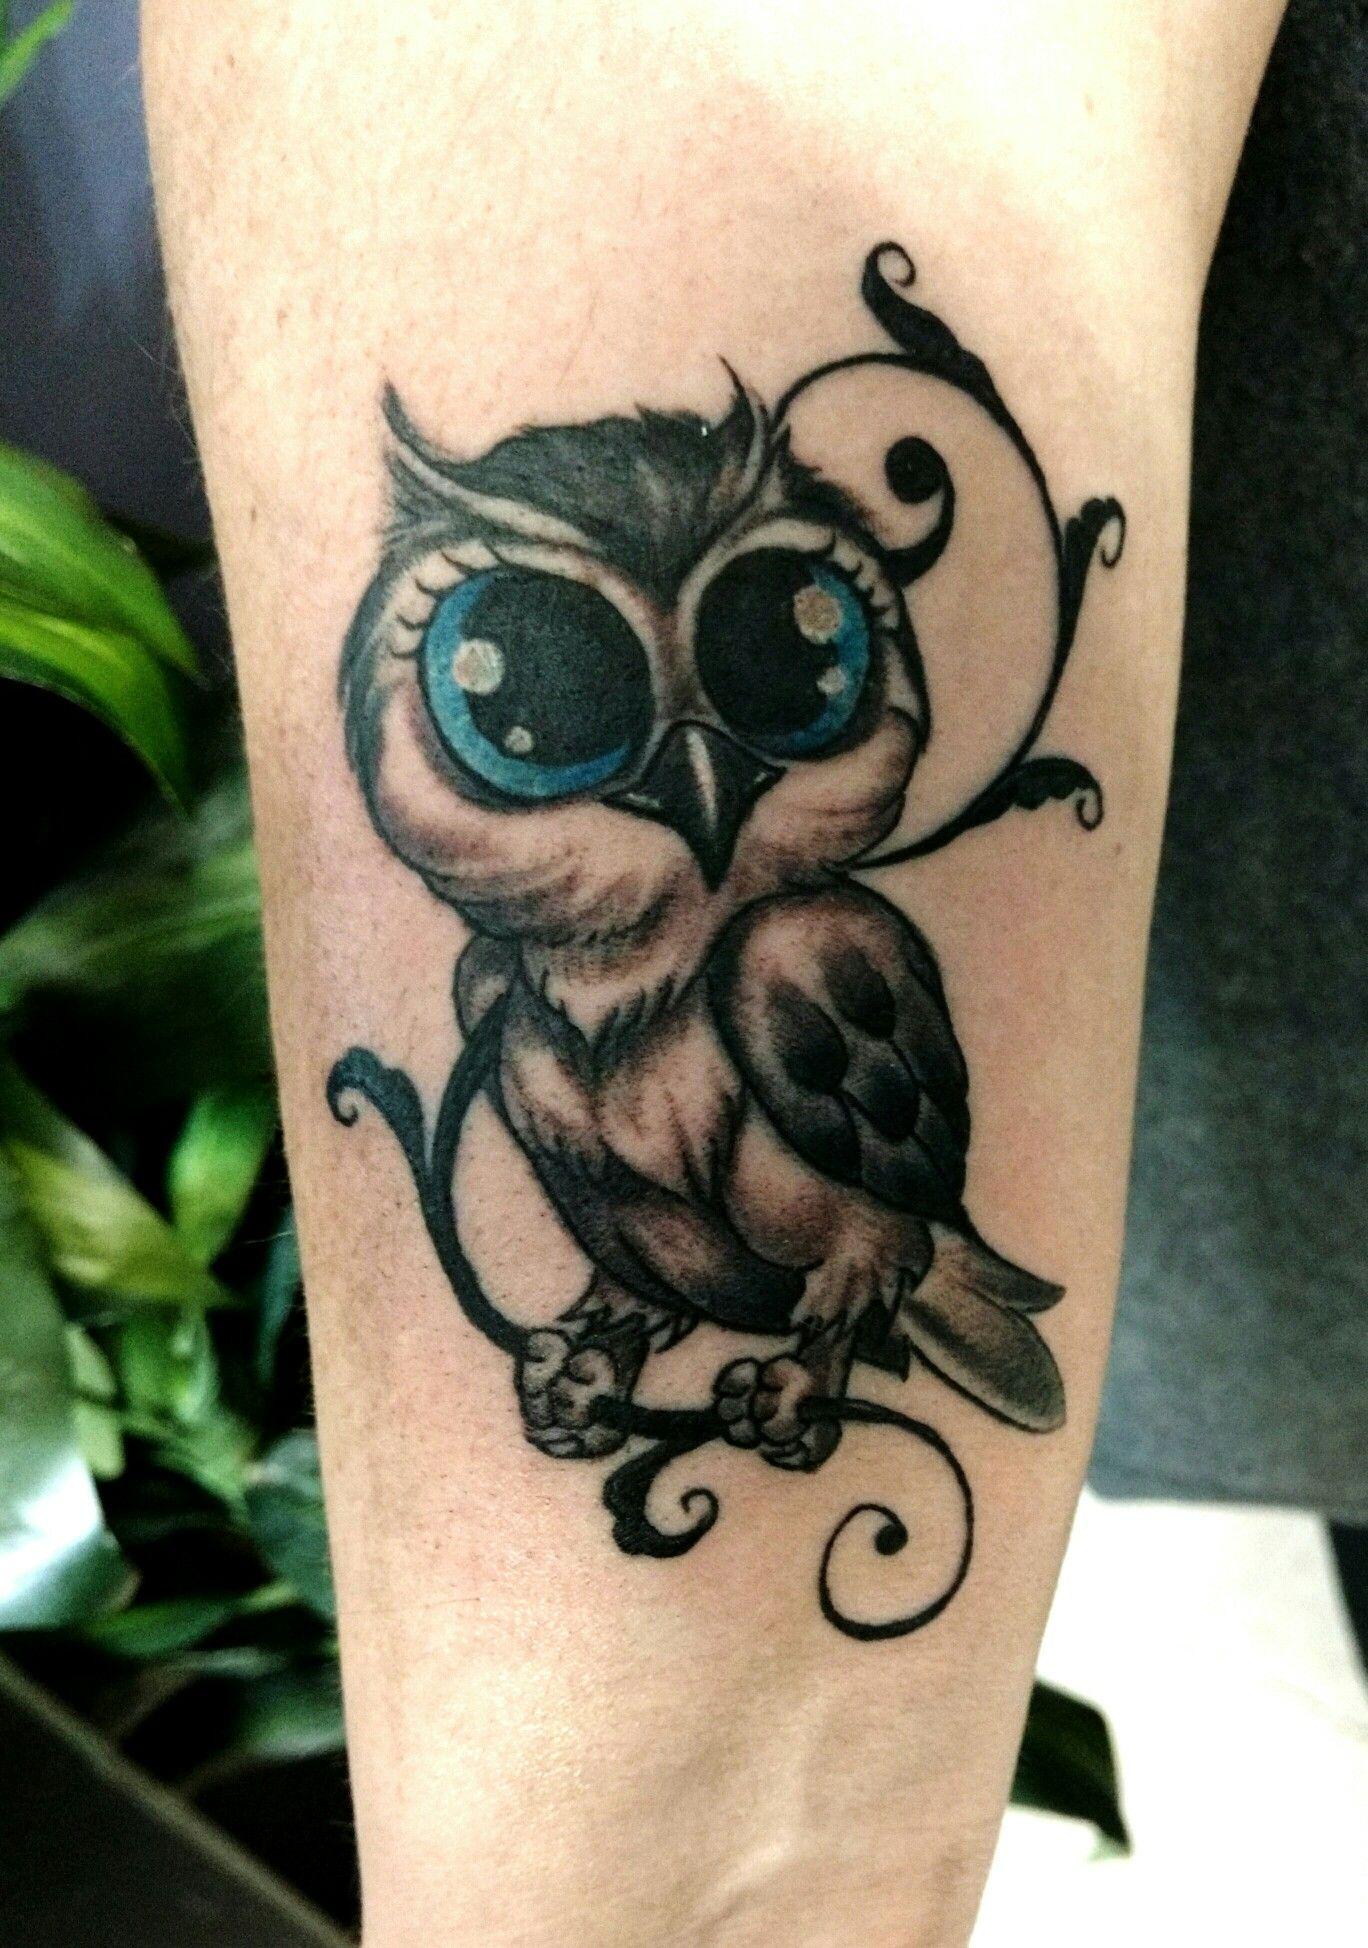 Baby Owl Tattoo Cute Owl Tattoo Baby Owl Tattoos Owl Tattoo Design